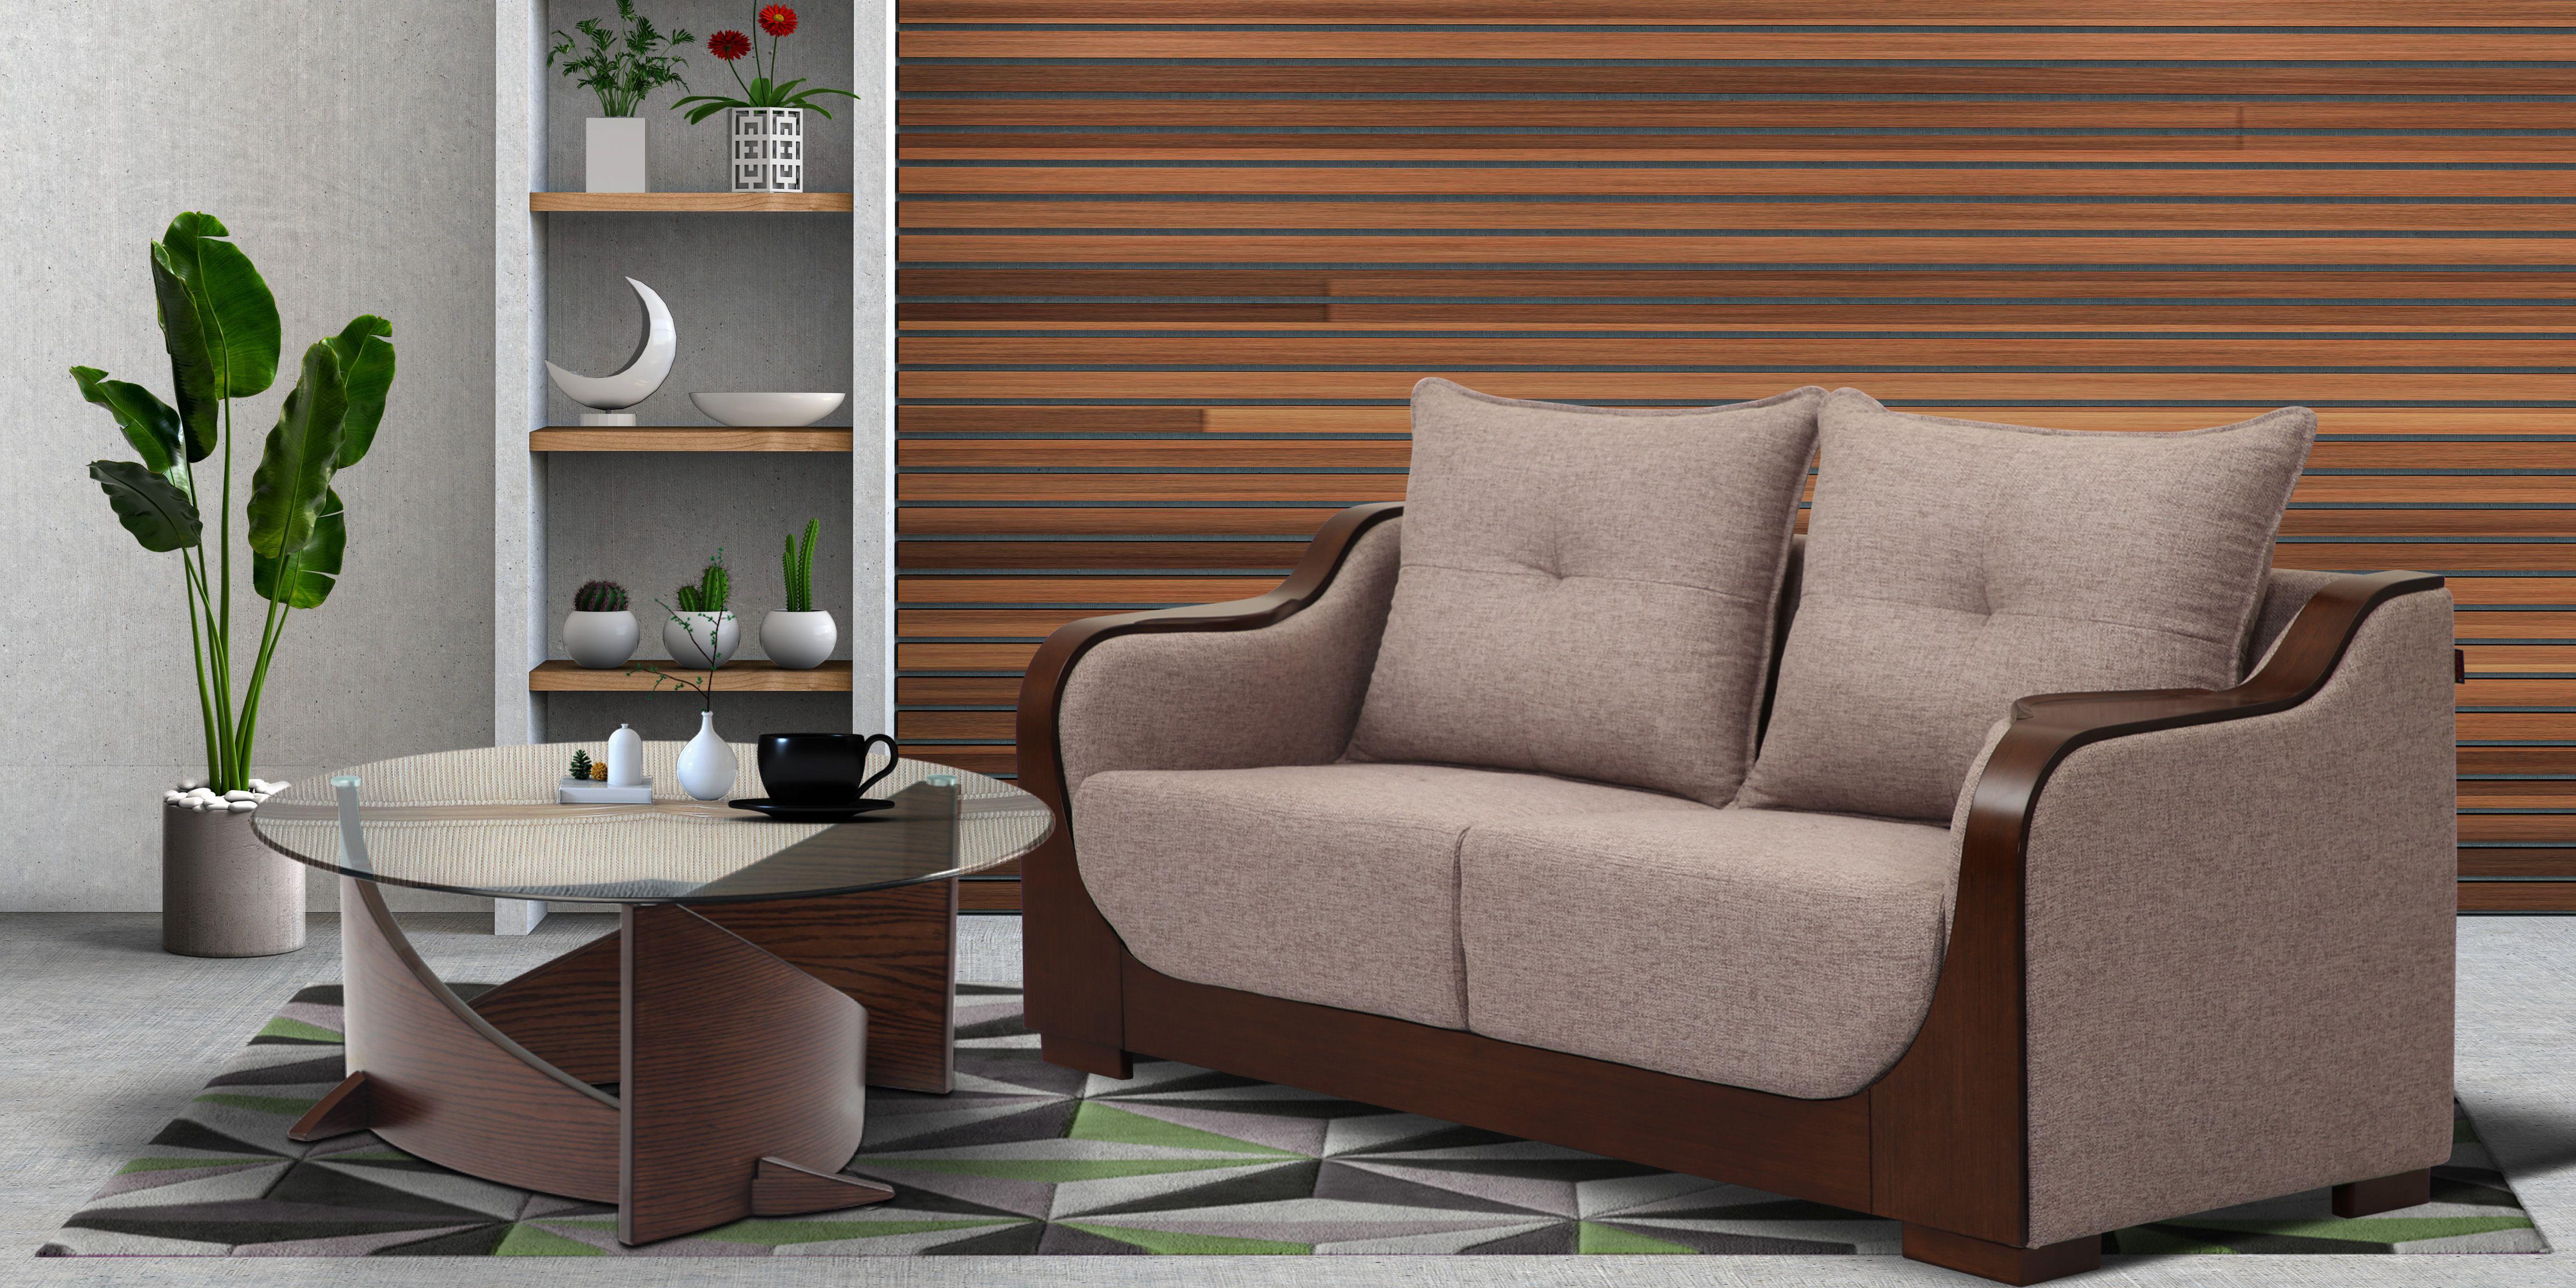 Office Sofa Price In Bangladesh In 2020 Sofa Price Office Sofa Home Decor